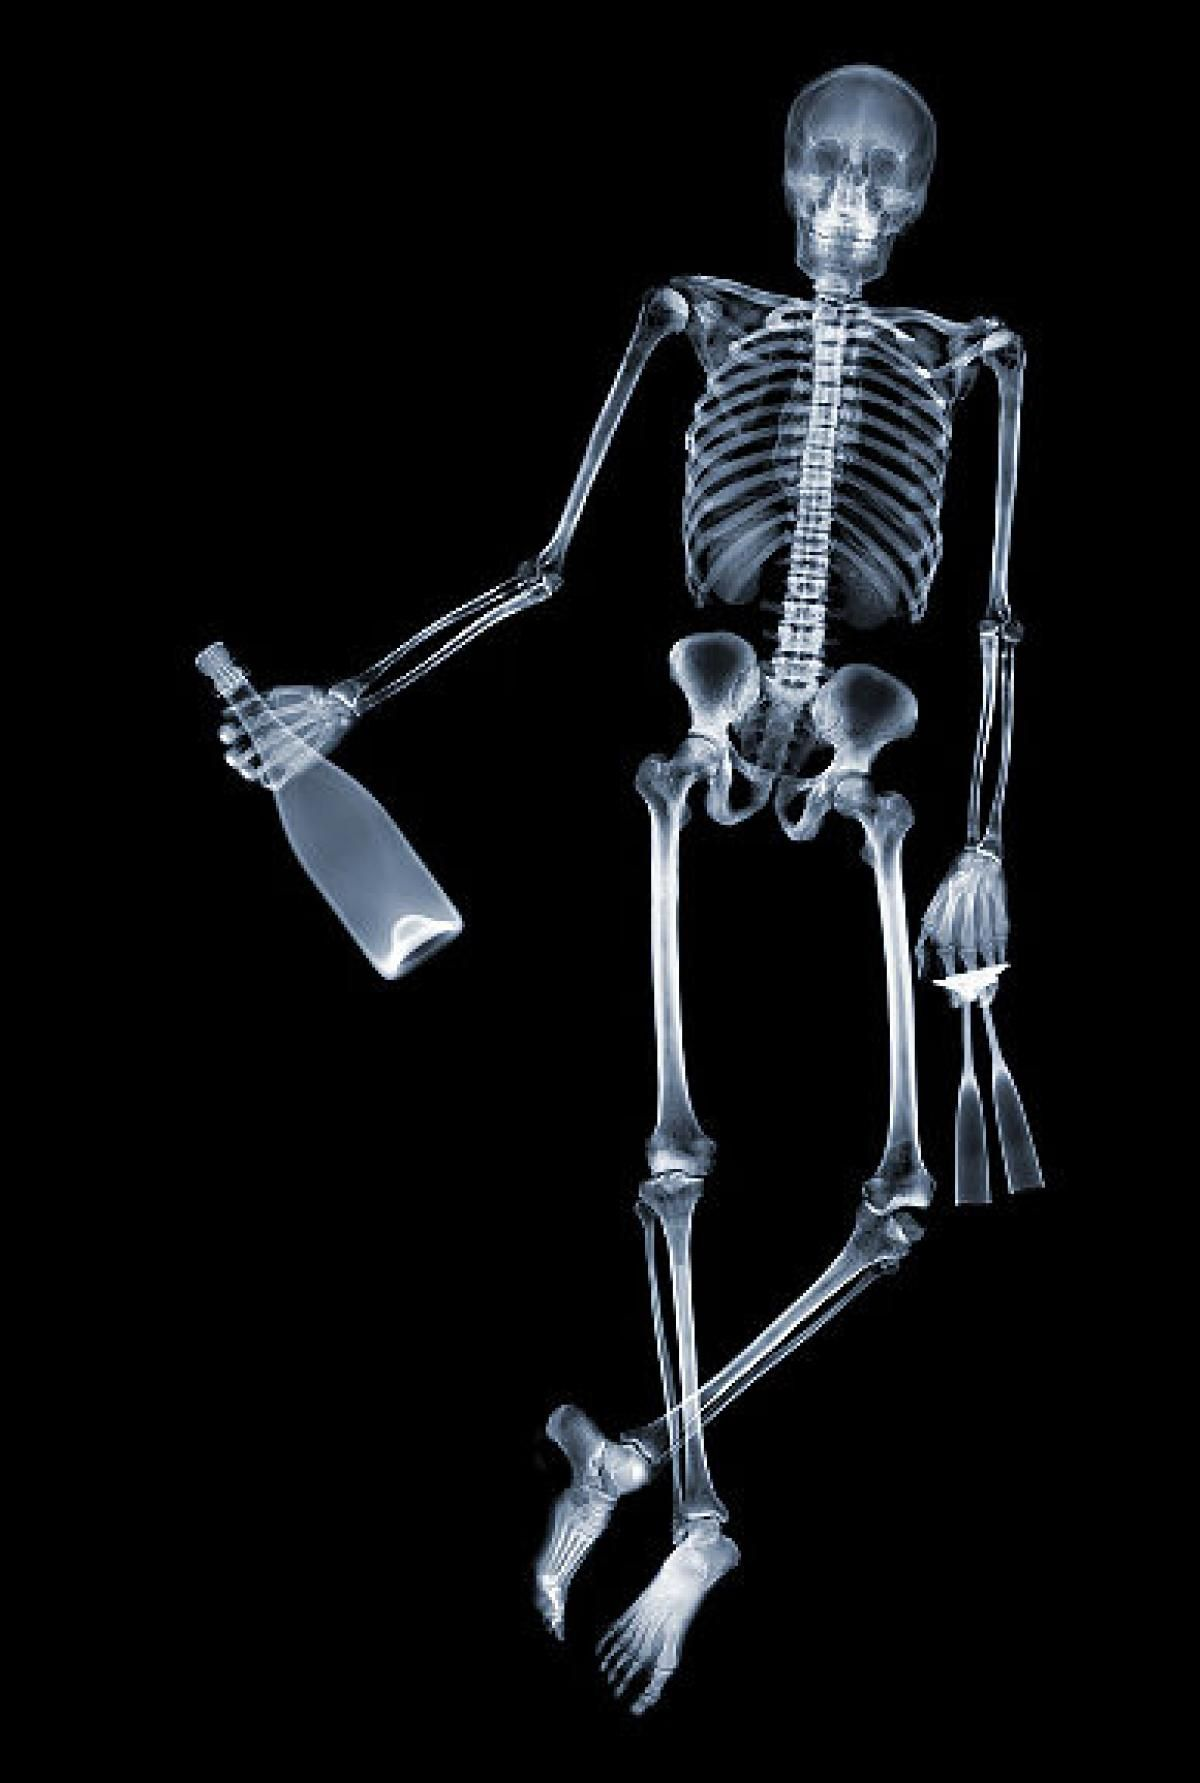 X Treme Art X Rays Turned Into Amazing Art Project